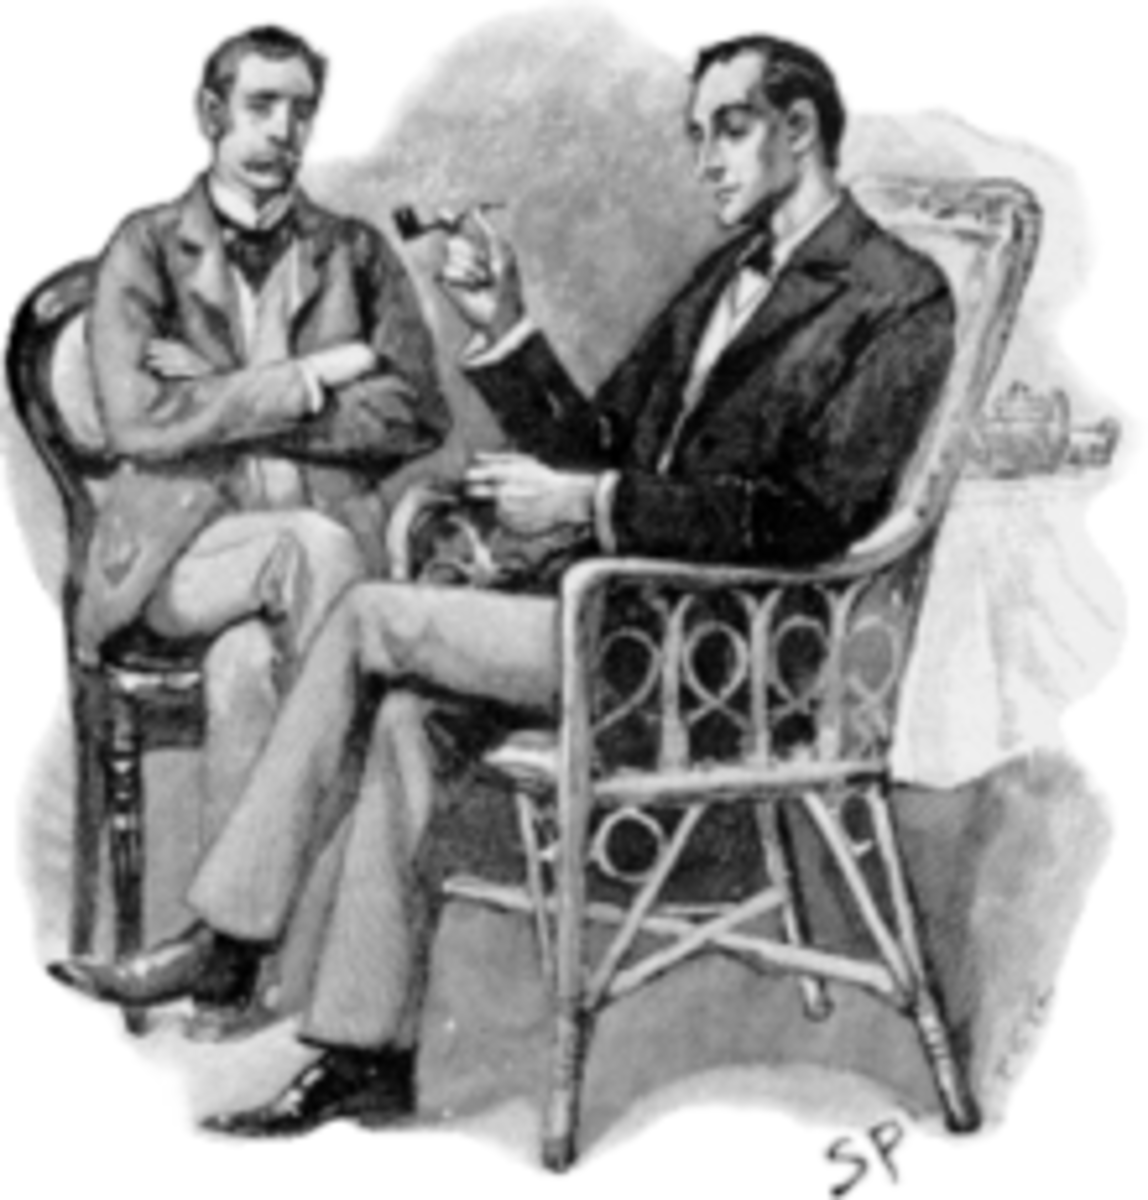 Dr. John H. Watson and Sherlock Holmes